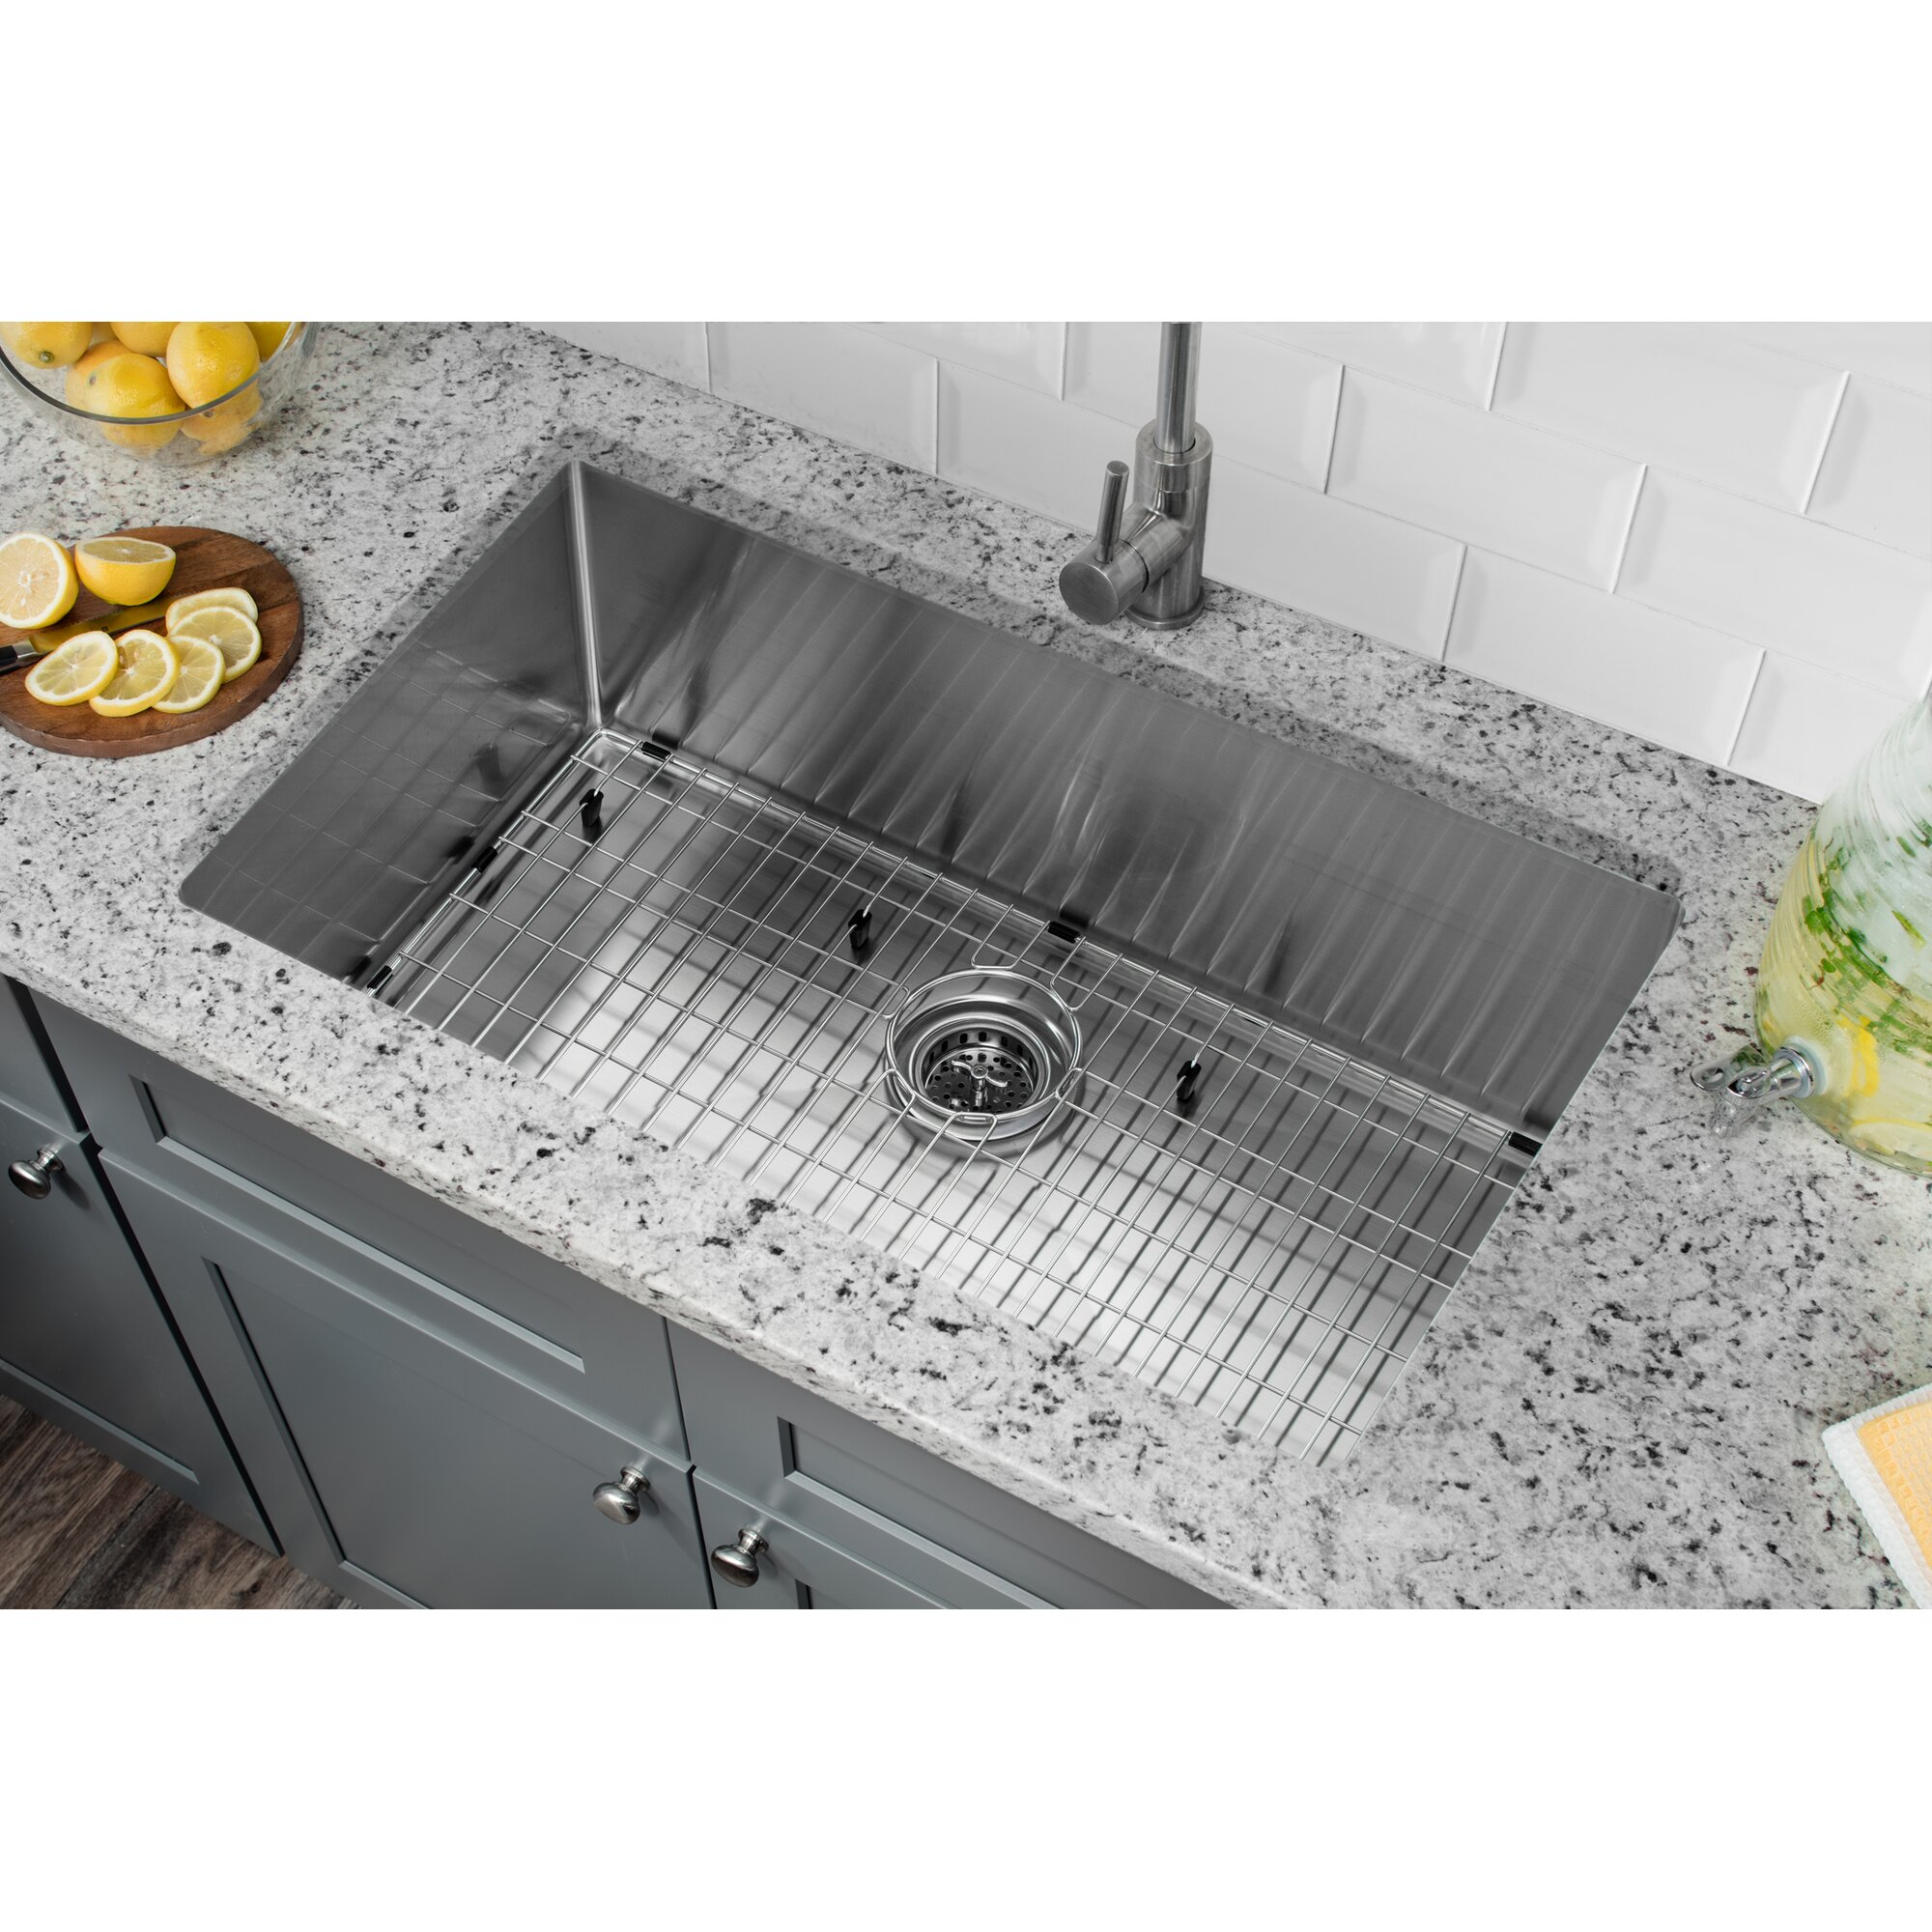 32 x 19 stainless steel 16 gauge radius single bowl kitchen sink - Stainless Steel Kitchen Sink Gauge